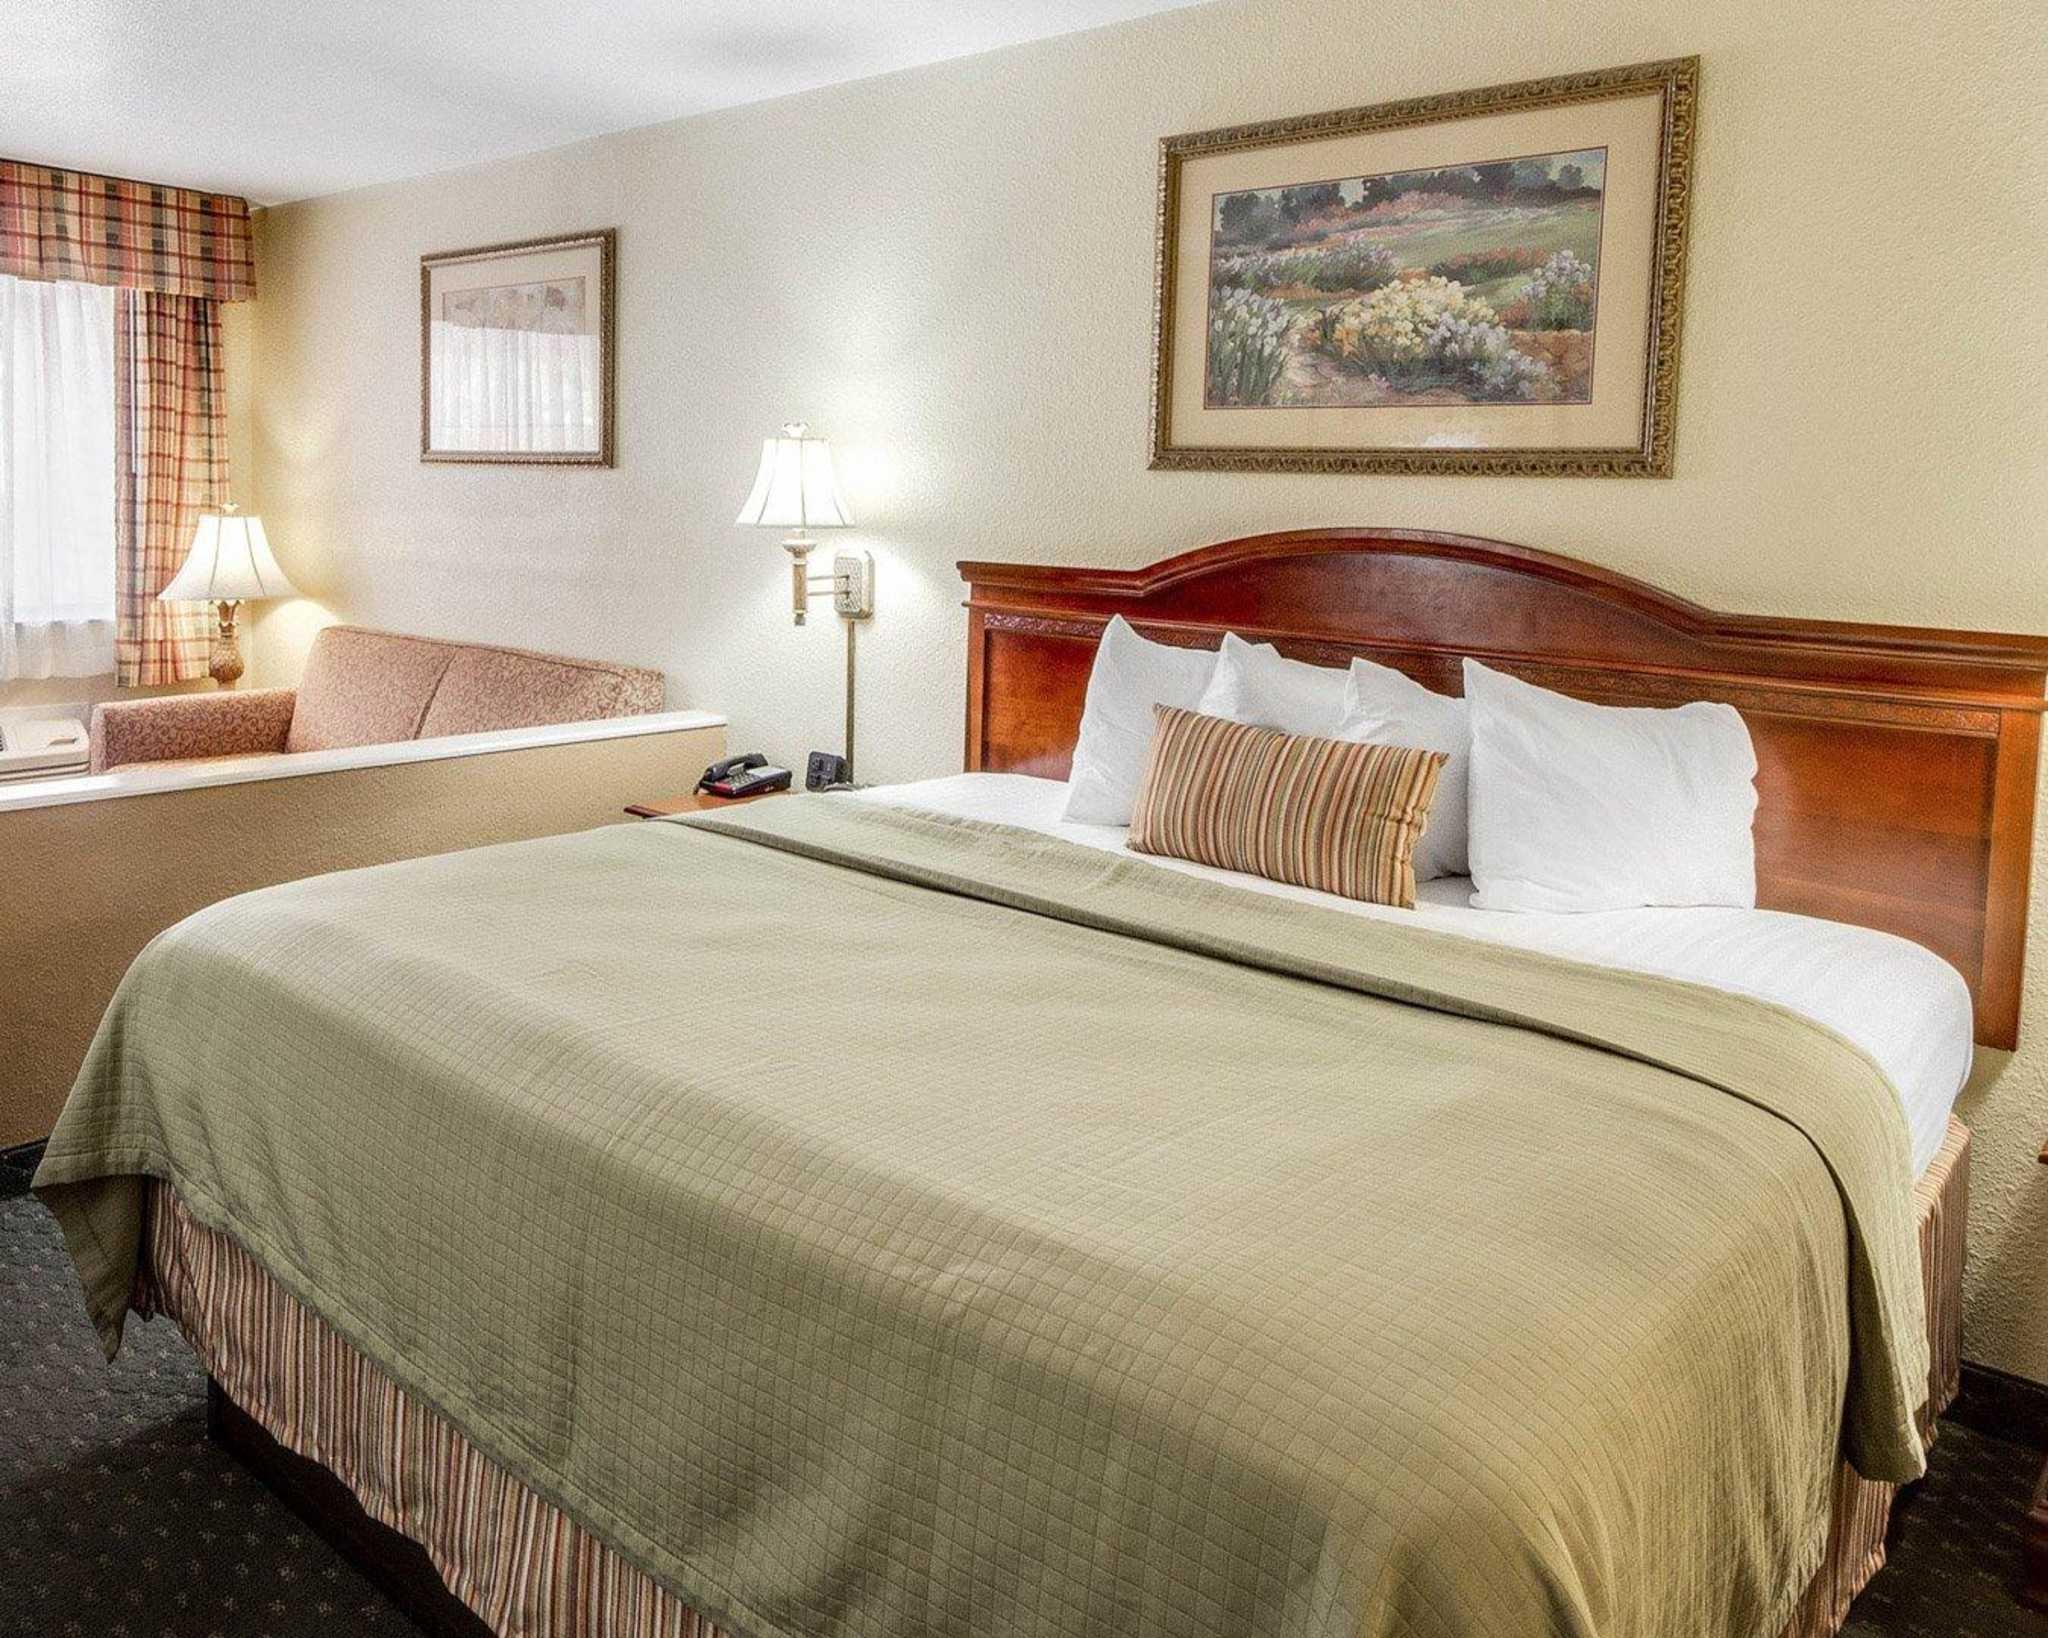 Quality Inn & Suites Eagle Pass image 20